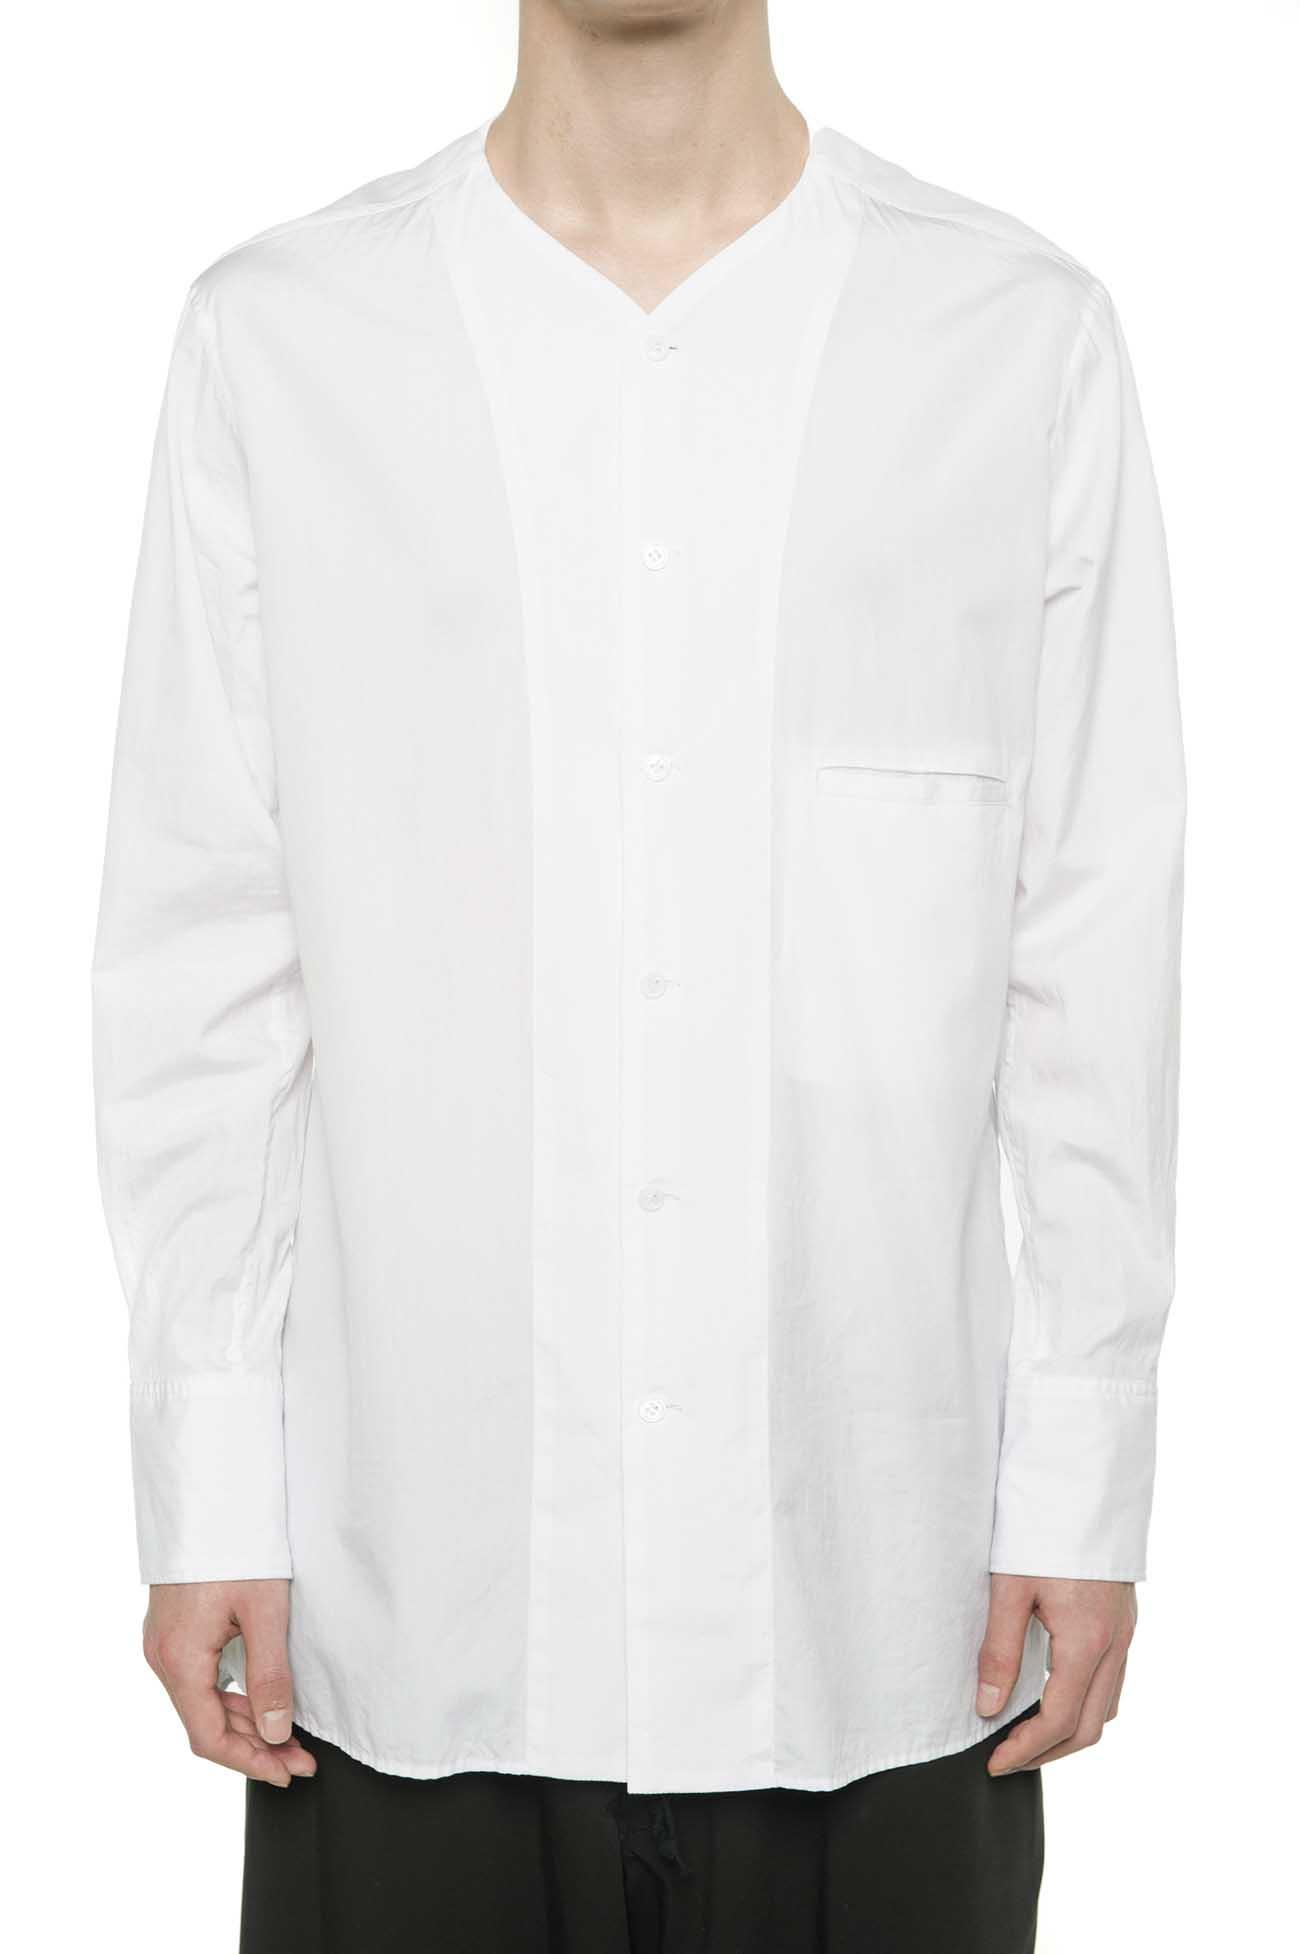 100/2 Broad No-Collar V-Open shirt